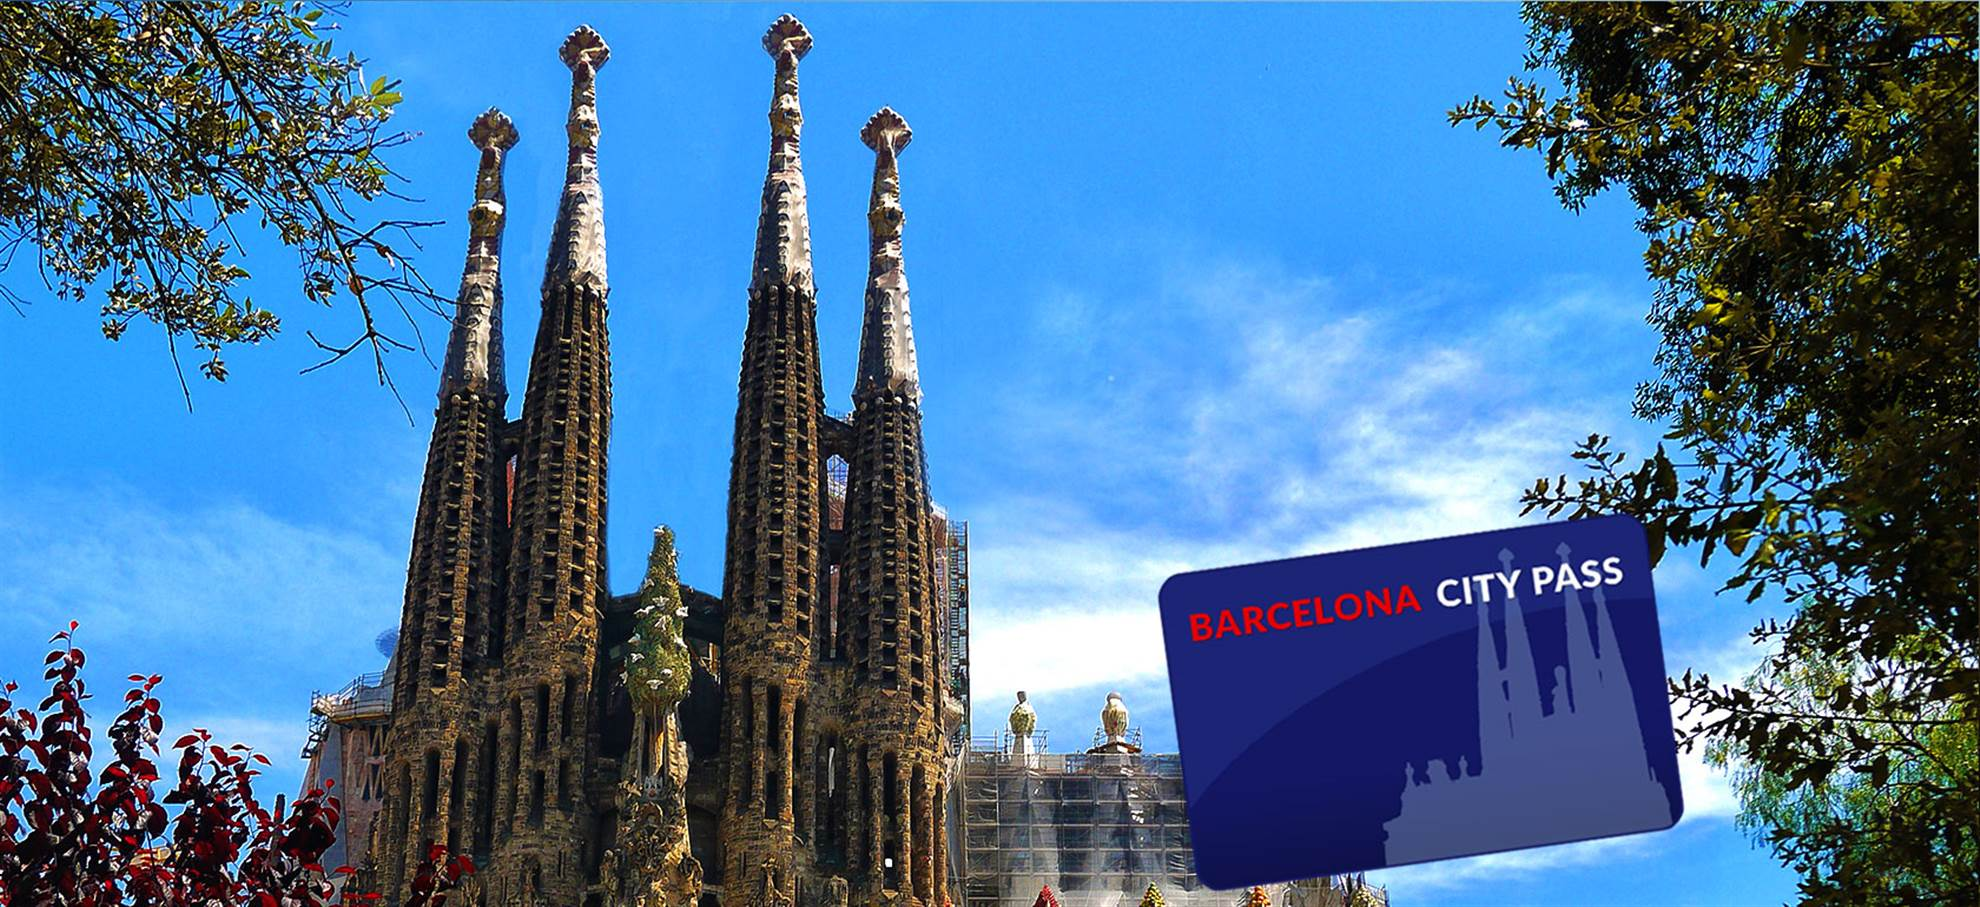 Barcelona City Pass (Inkl. Sagrada Familia, Park Guell)